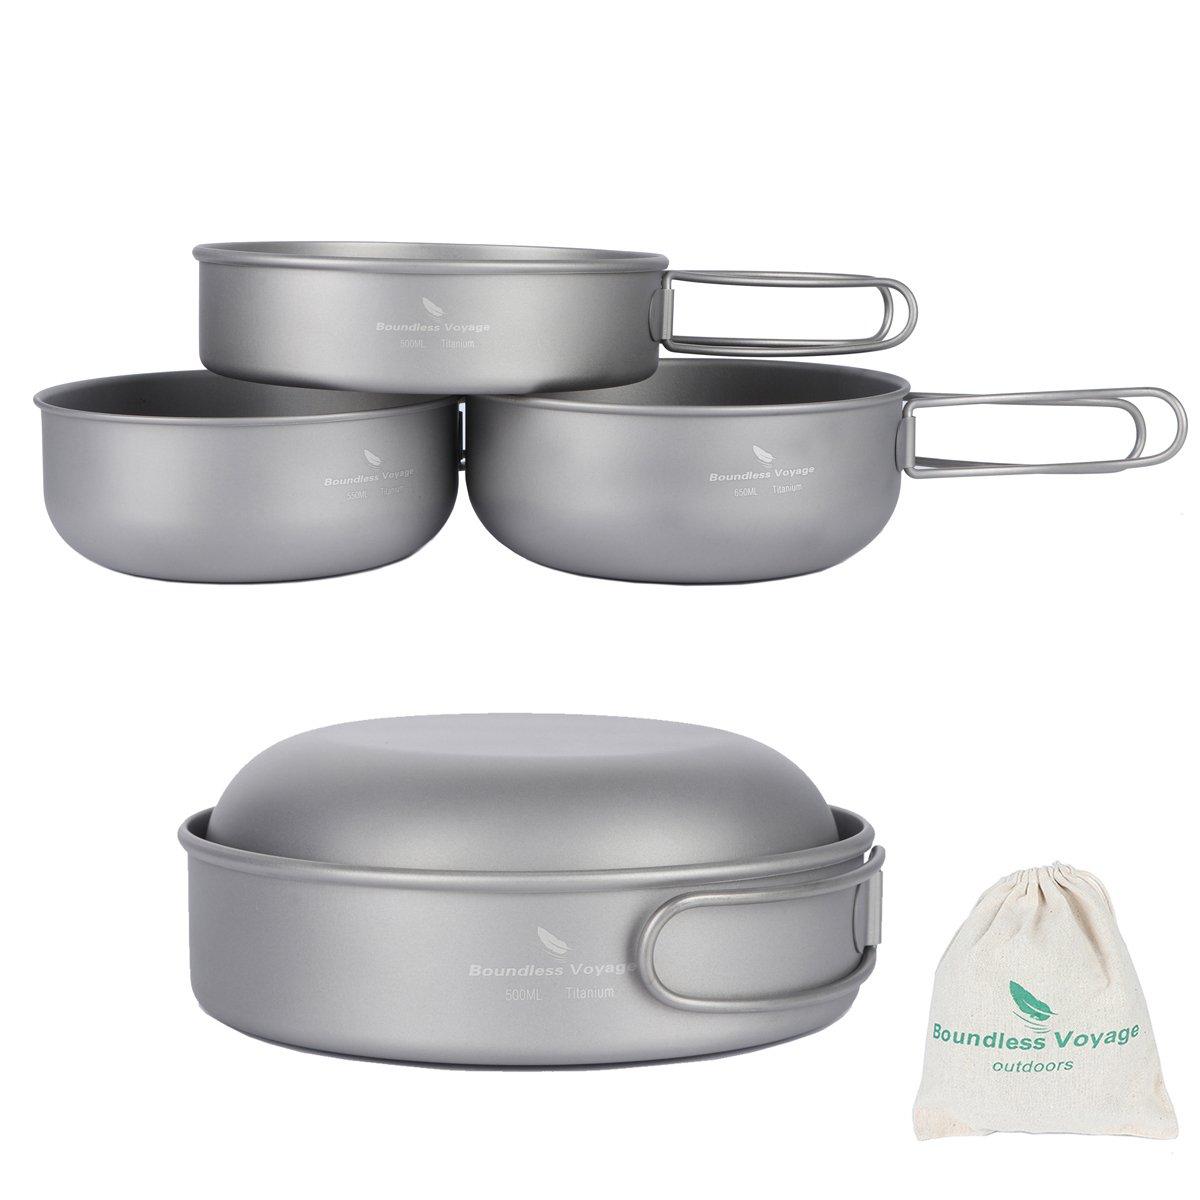 iBasingo 3-piece Set Titanium Bowl Set Outdoor Camping Pan Cookware Pot with Folding-handle Picnic Dishes by iBasingo